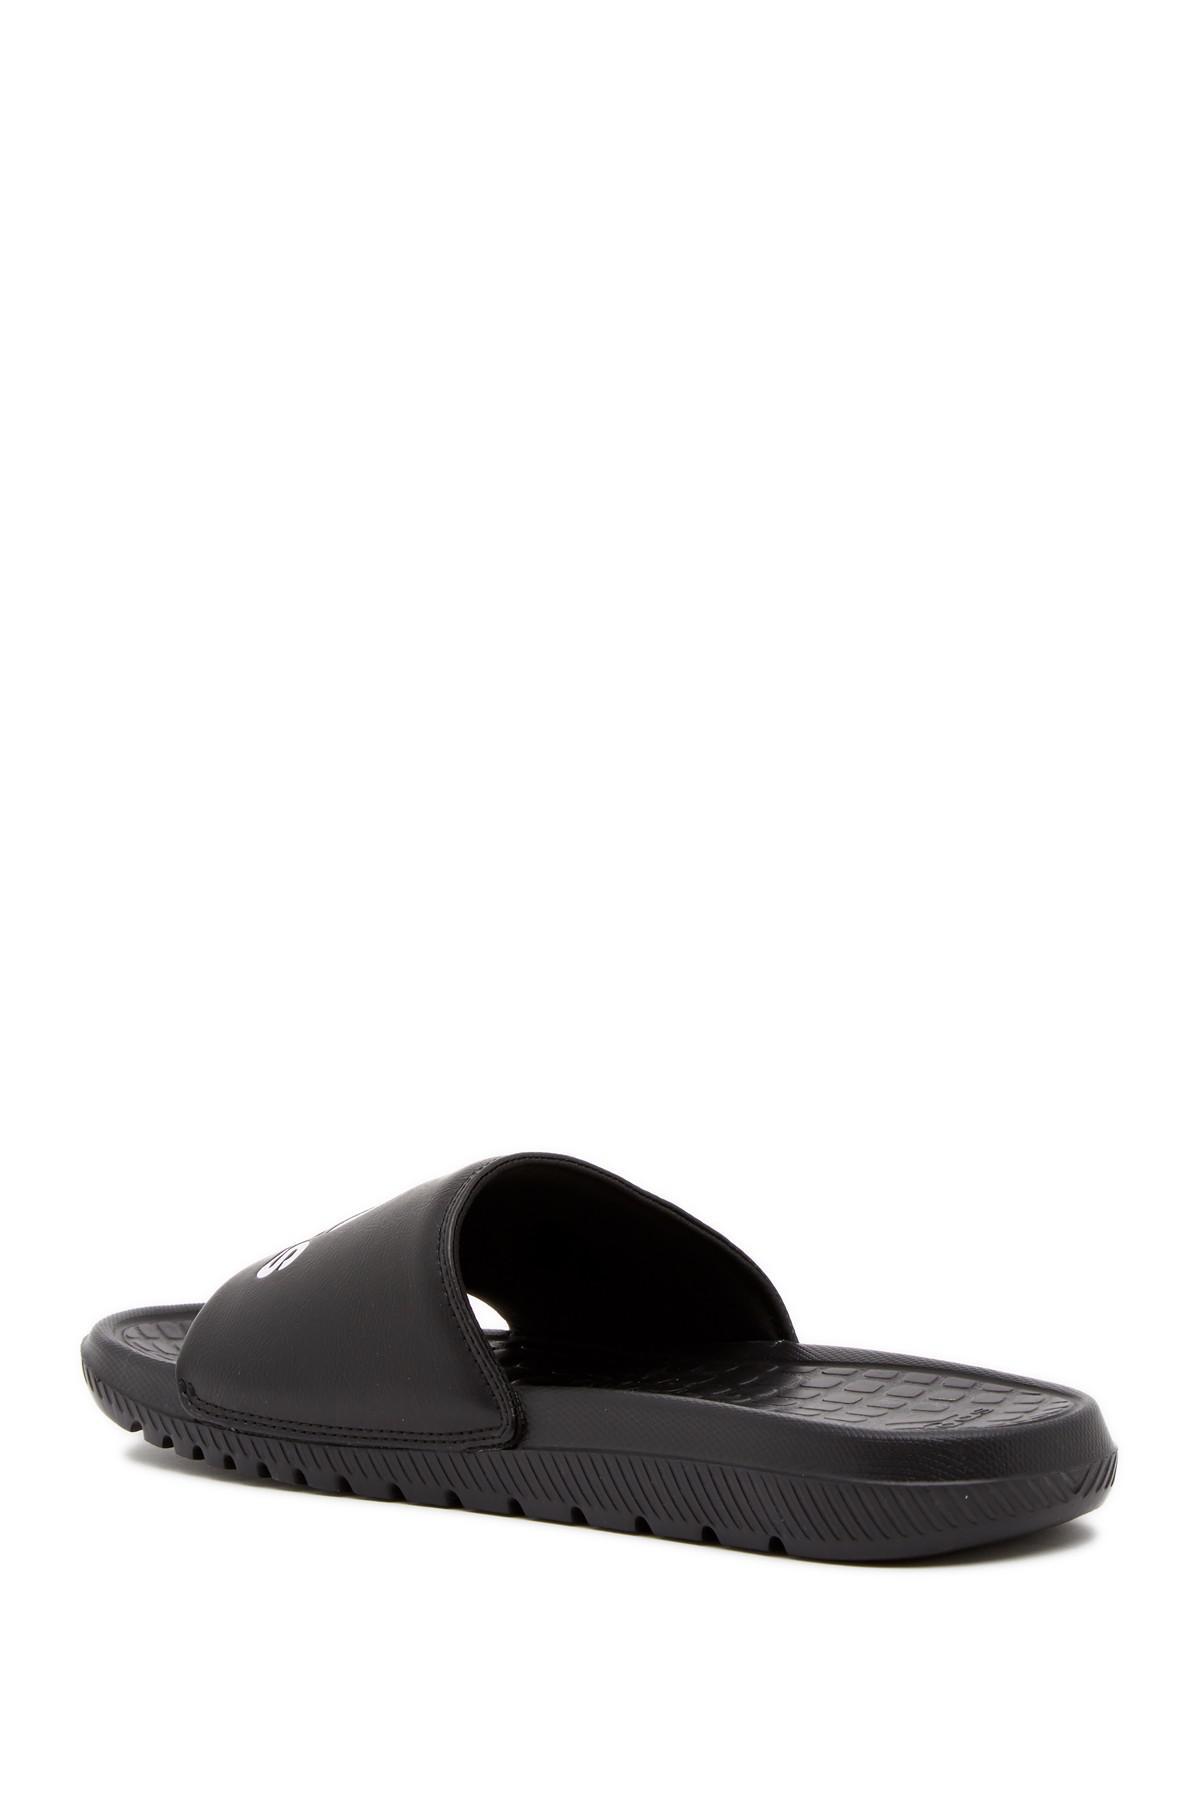 e541d85ff5f6 Adidas - Black Voloomix Slide Sandal for Men - Lyst. View fullscreen